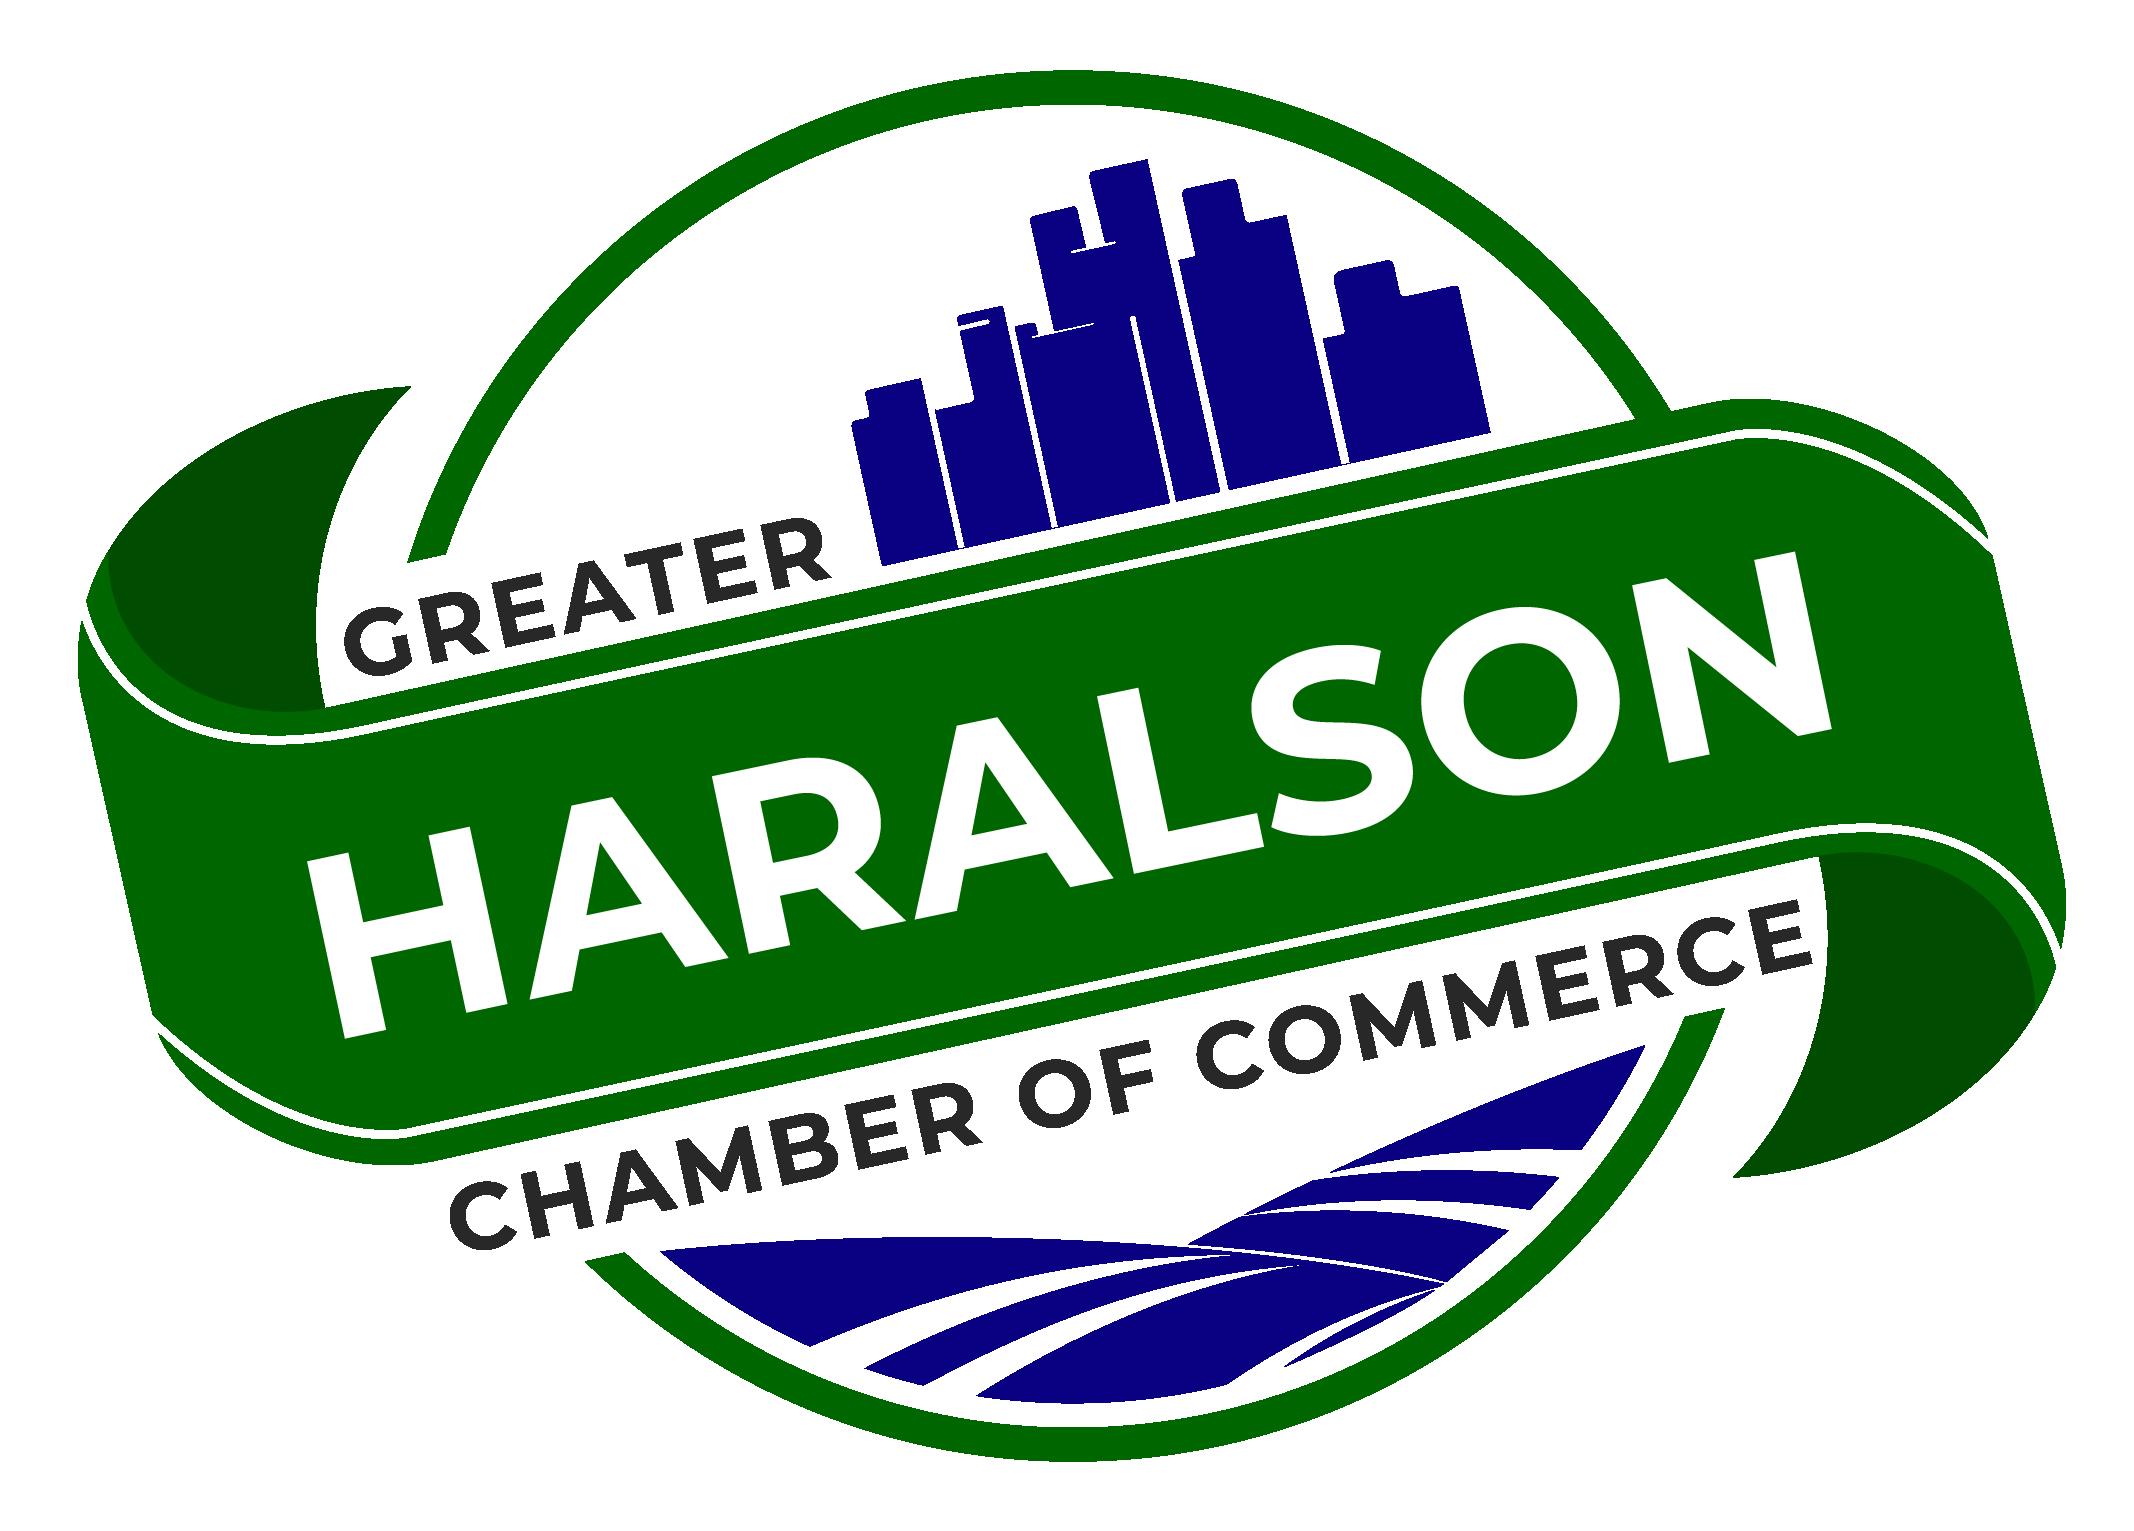 GreaterHaralsonChamberofCommerce_favicon-01